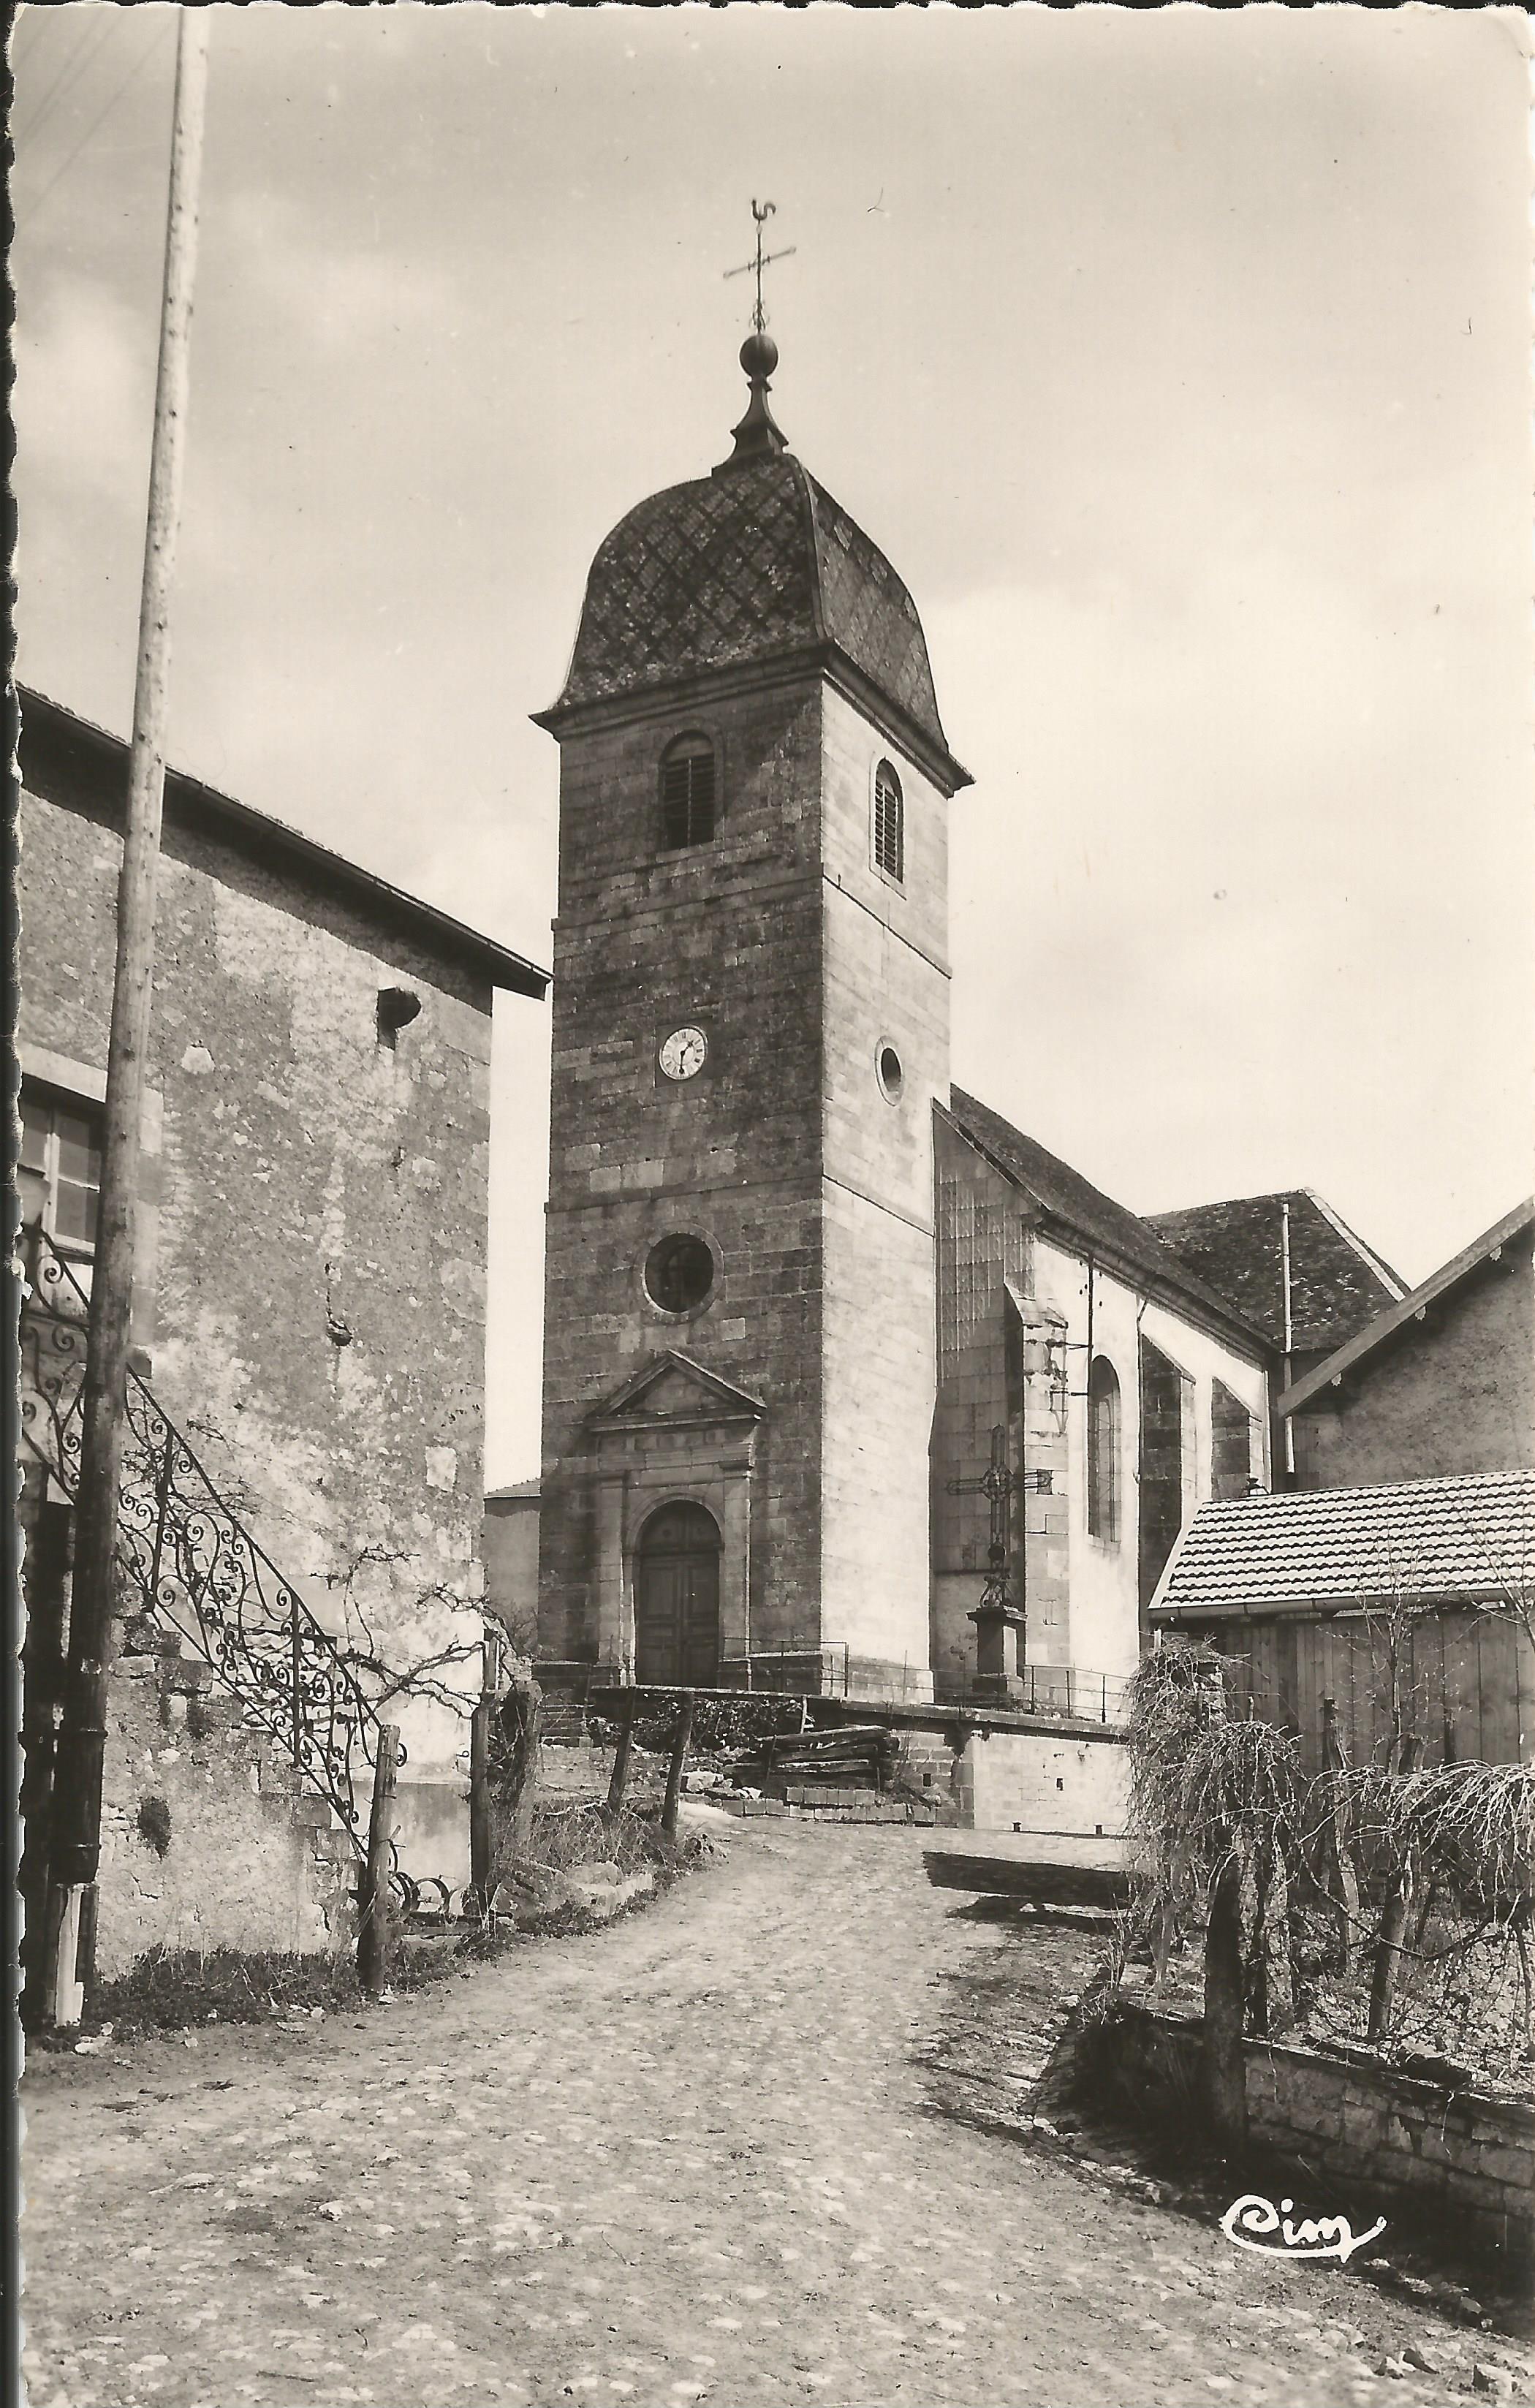 https://www.villers-les-luxeuil.com/projets/villers/files/images/Cartes_postales/Eglise_2015/LEglise_2.jpg